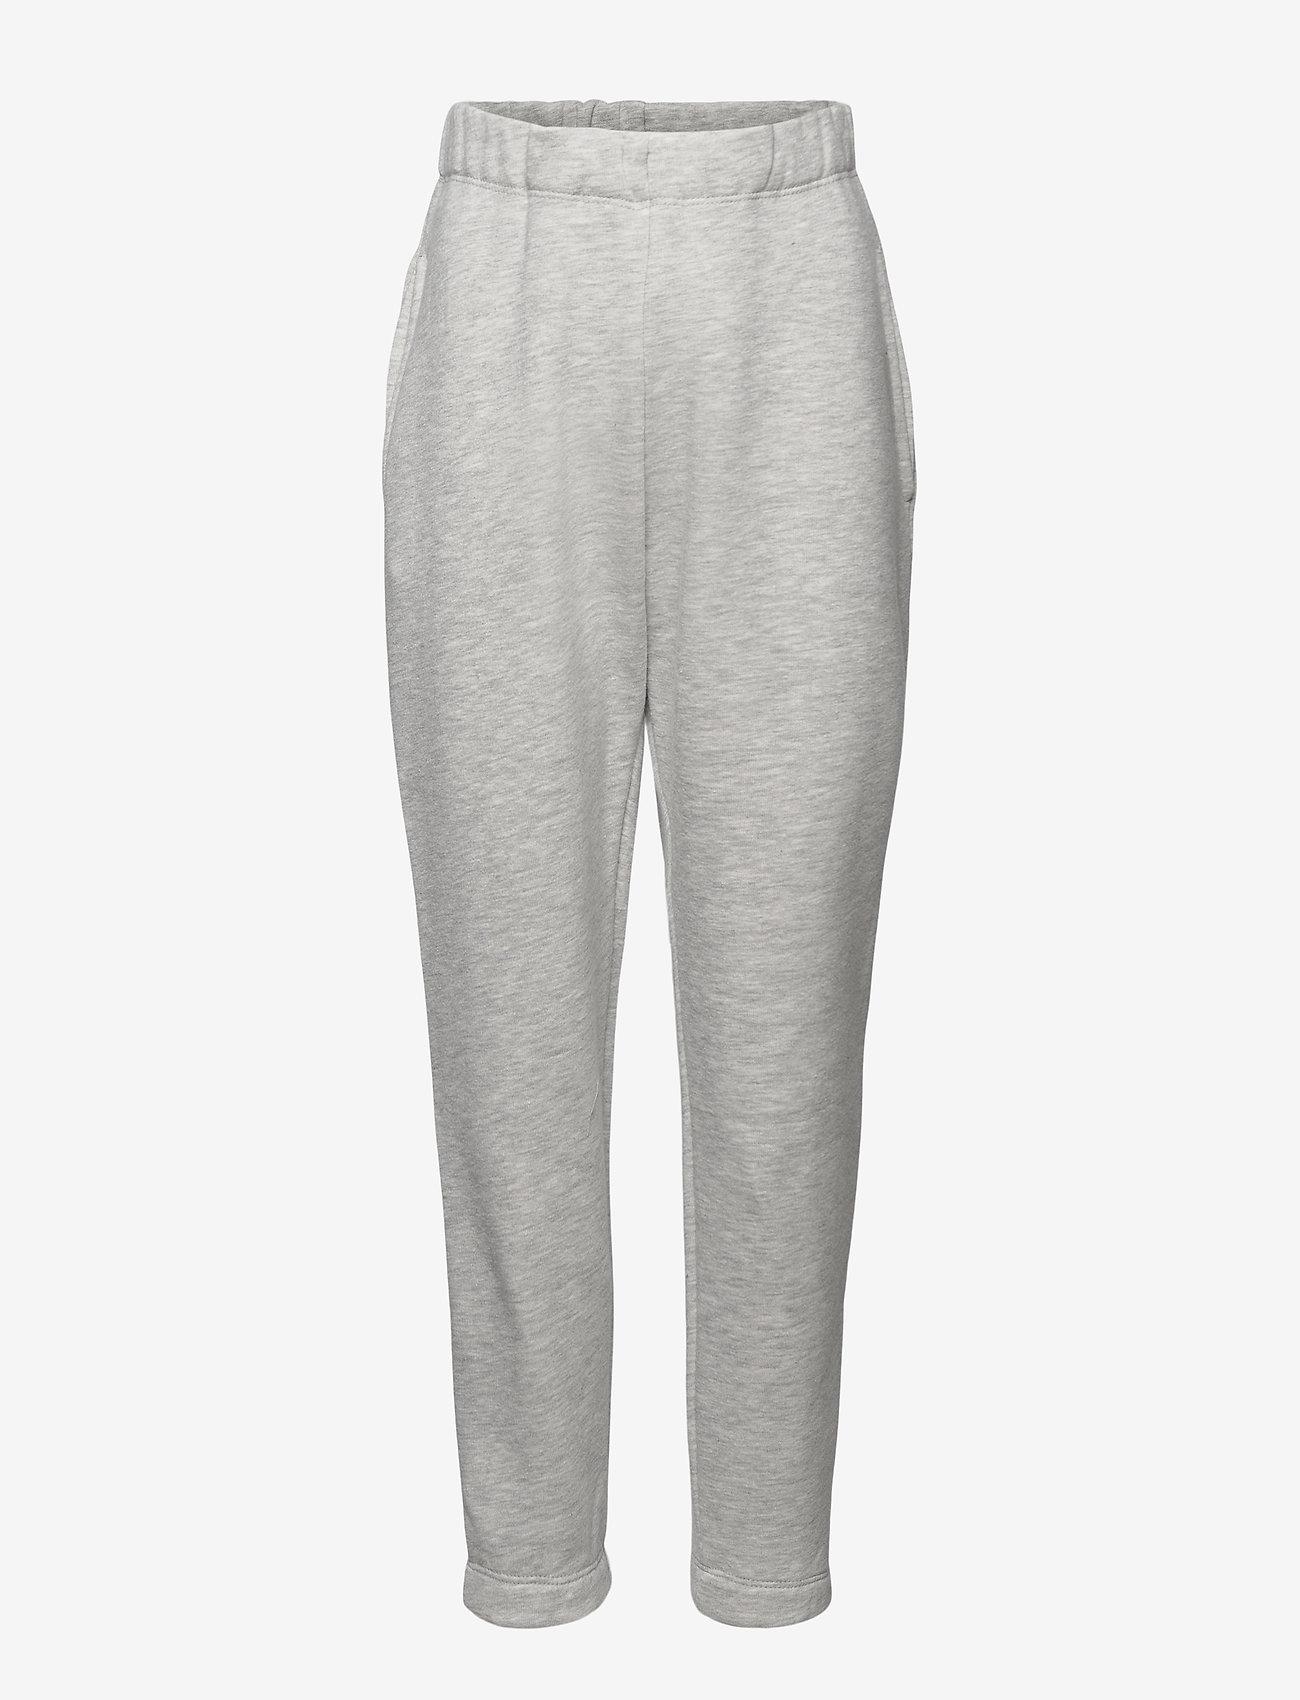 LMTD - NLFOPAL R SWEAT PANT NOOS - jogginghosen - grey melange - 0